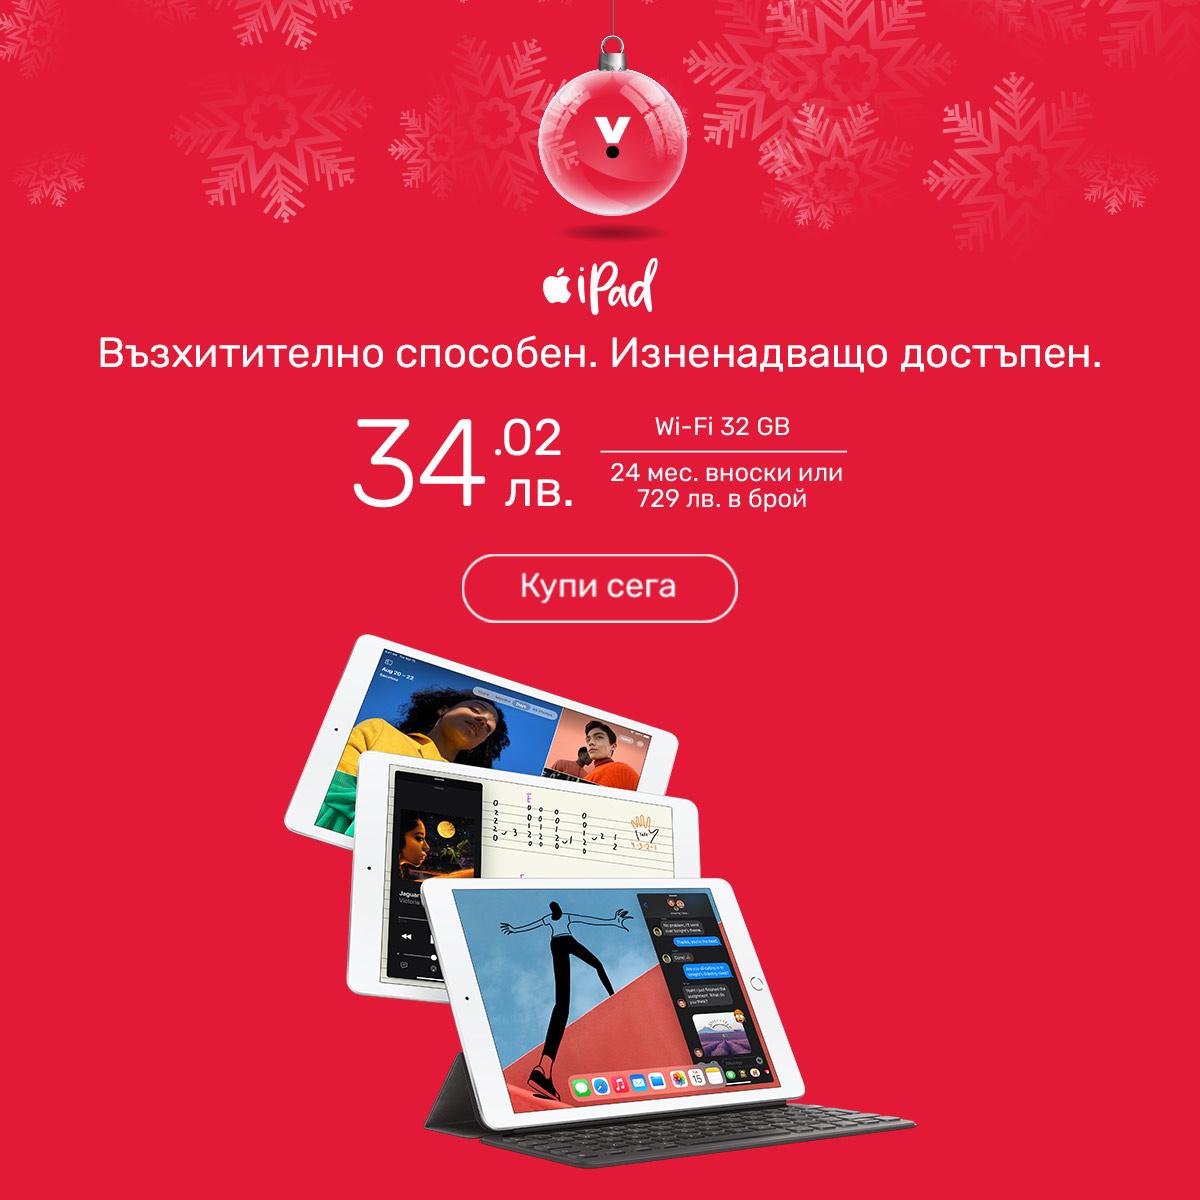 iPad 8 - 729 лв